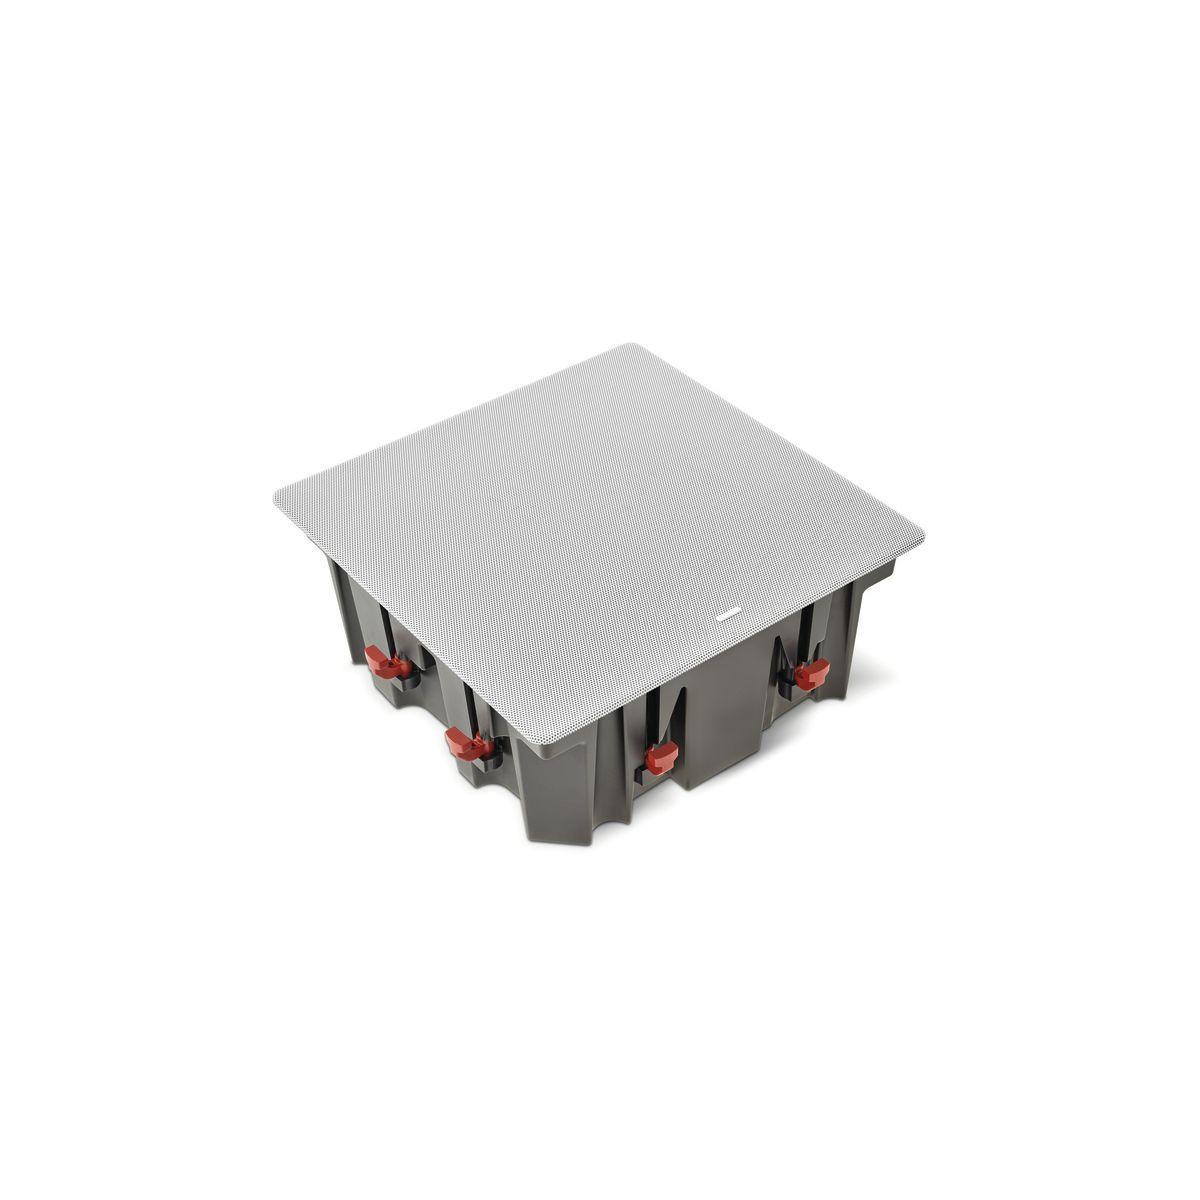 Enceinte encastrable focal 100 ic lcr5 - livraison offerte : code livprem